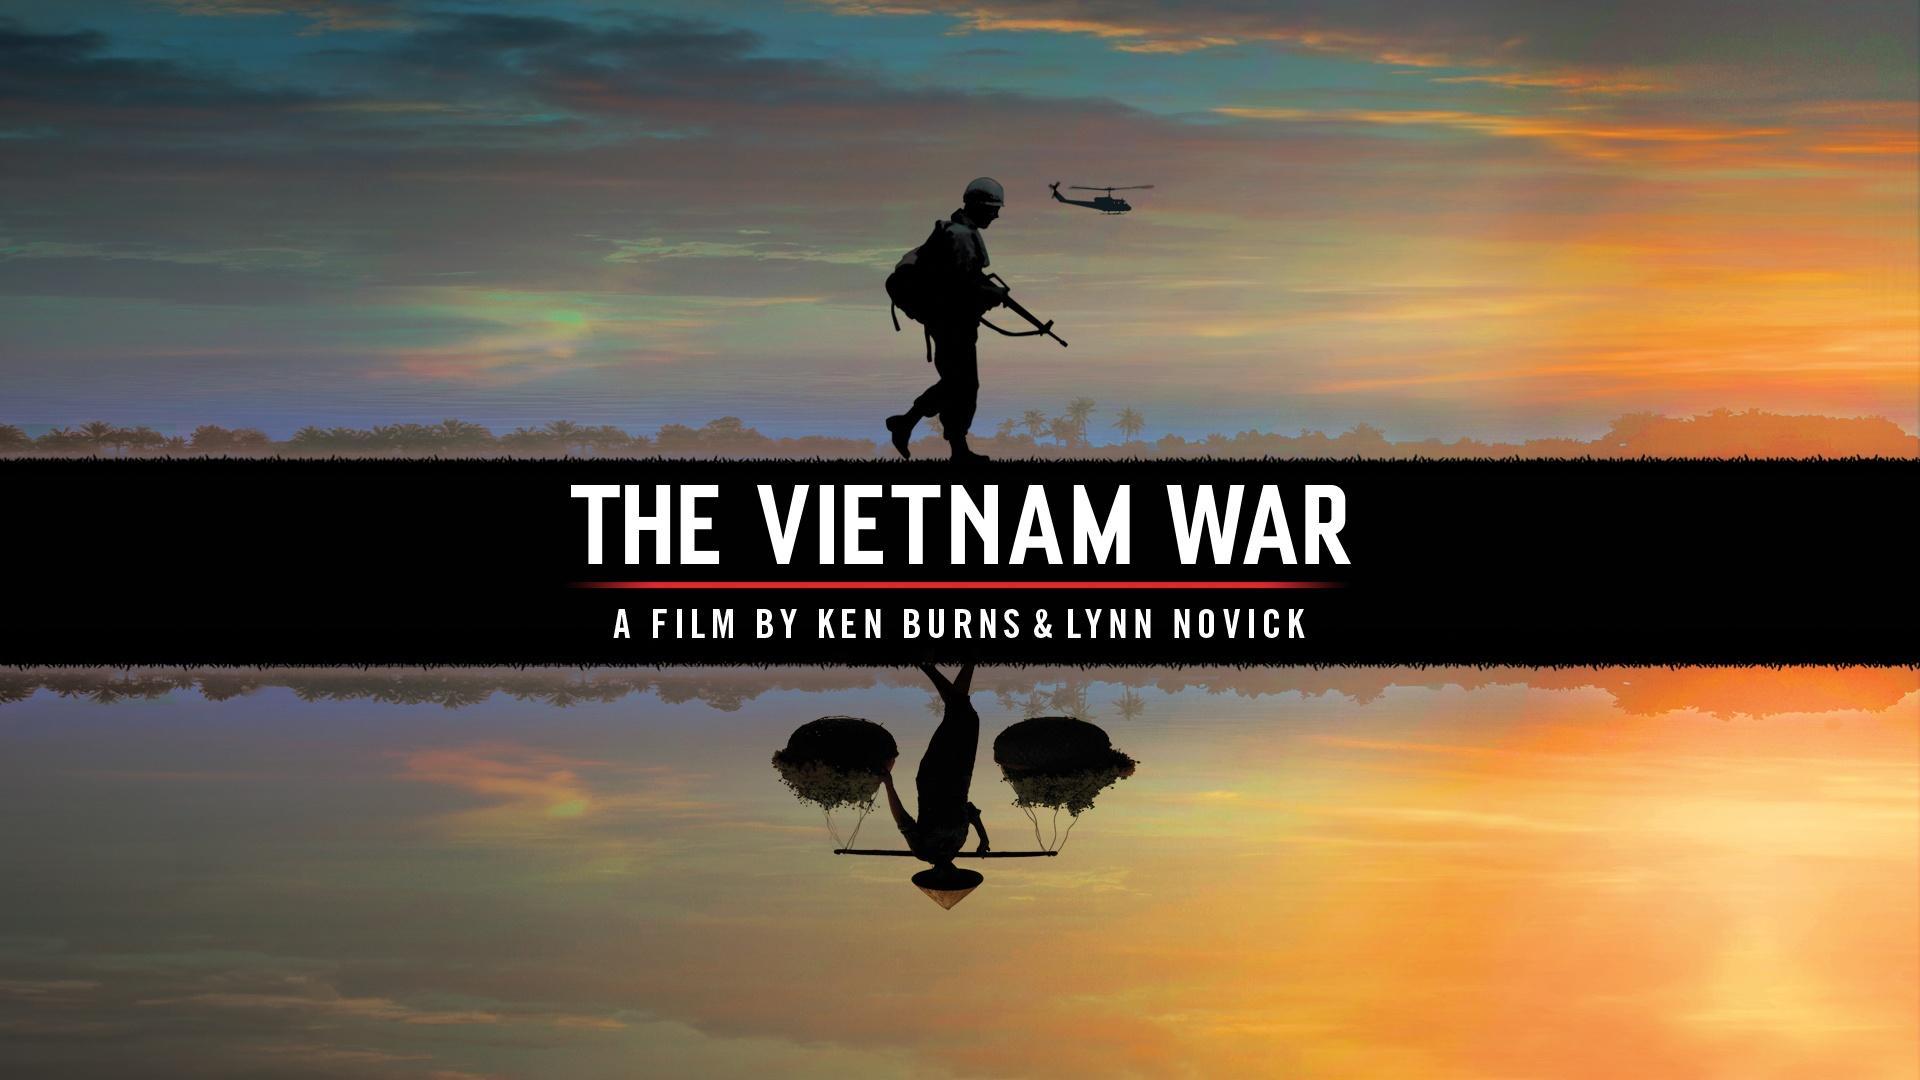 The Vietnam War - A Film by Ken Burns and Lynn Novick